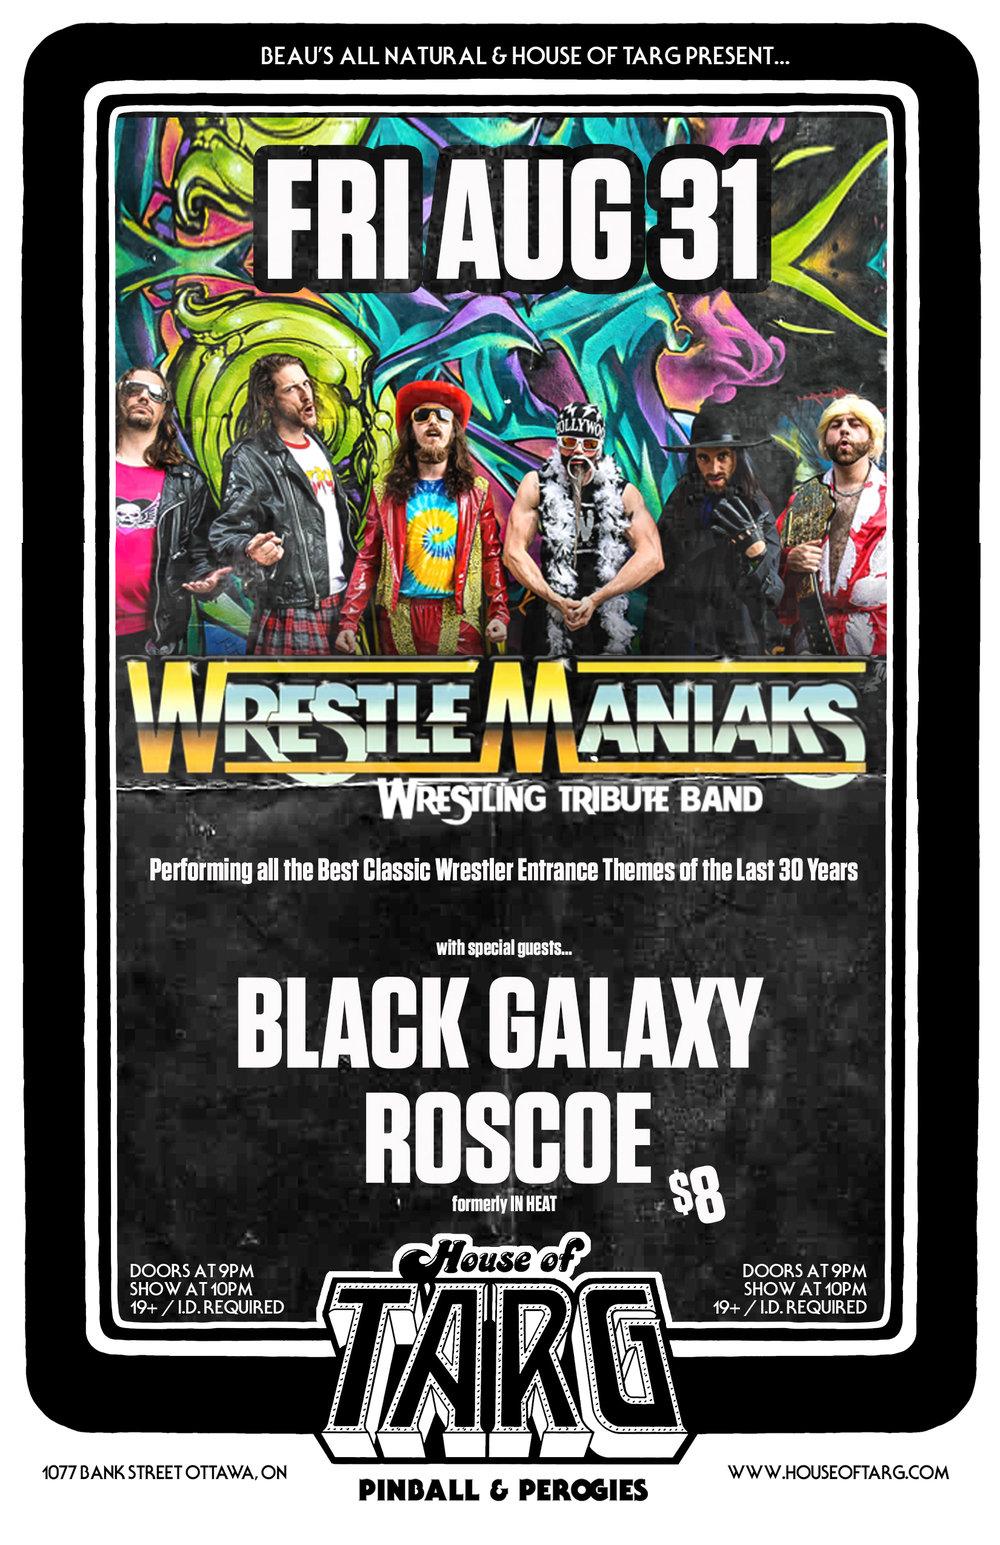 WrestleManiaks Aug 31.jpg